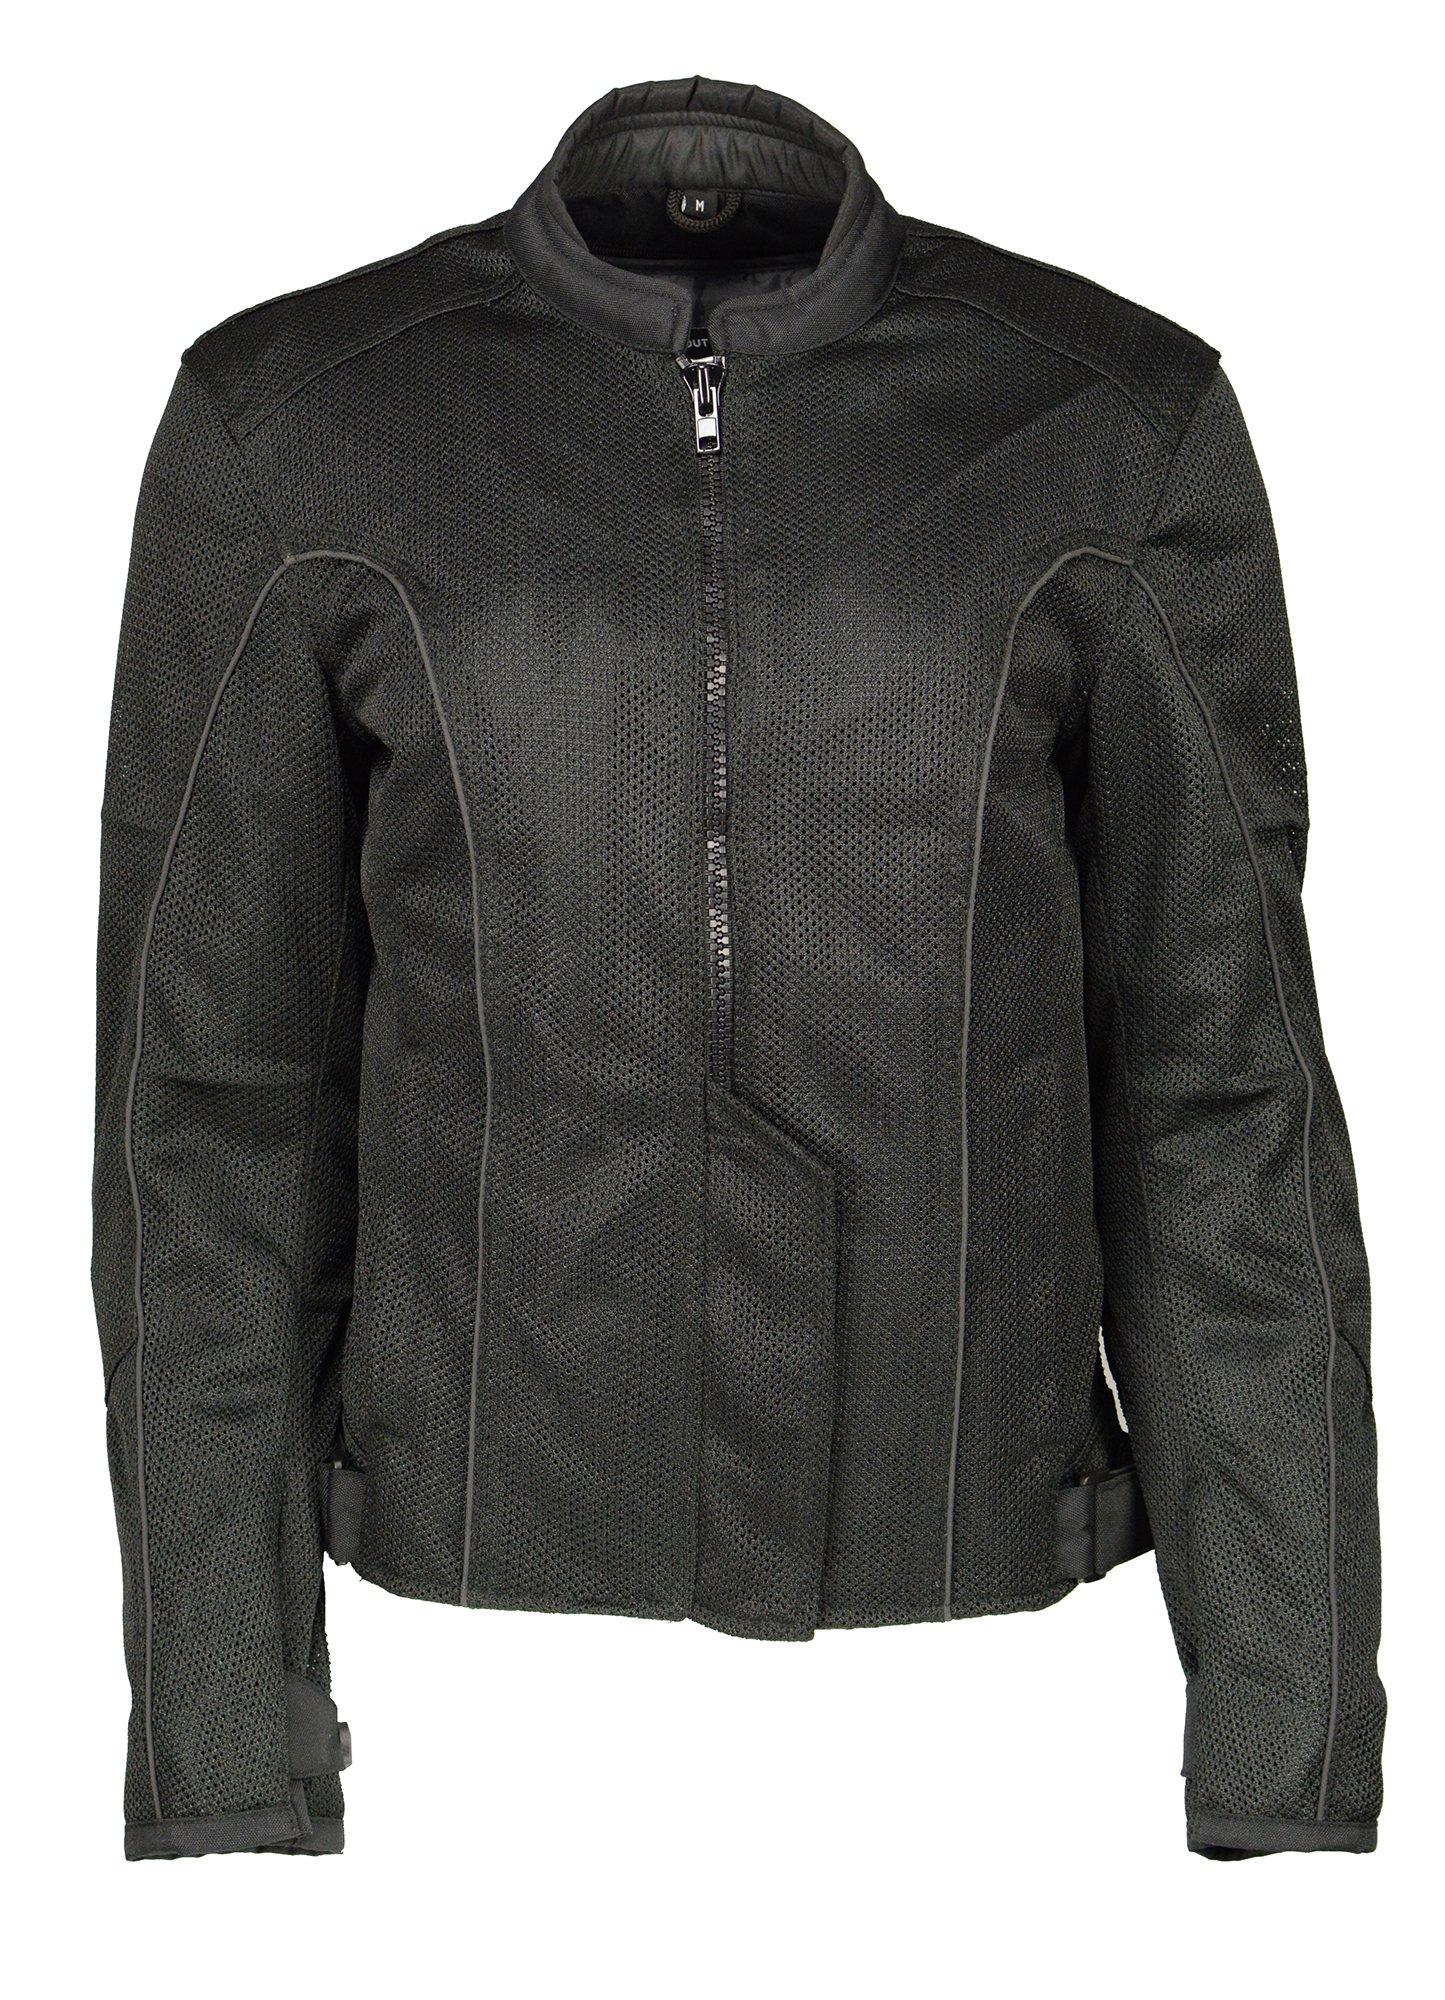 M-BOSS APPAREL-Ladies Mesh Racer Jacket w/Full Armor-BLACK-MD